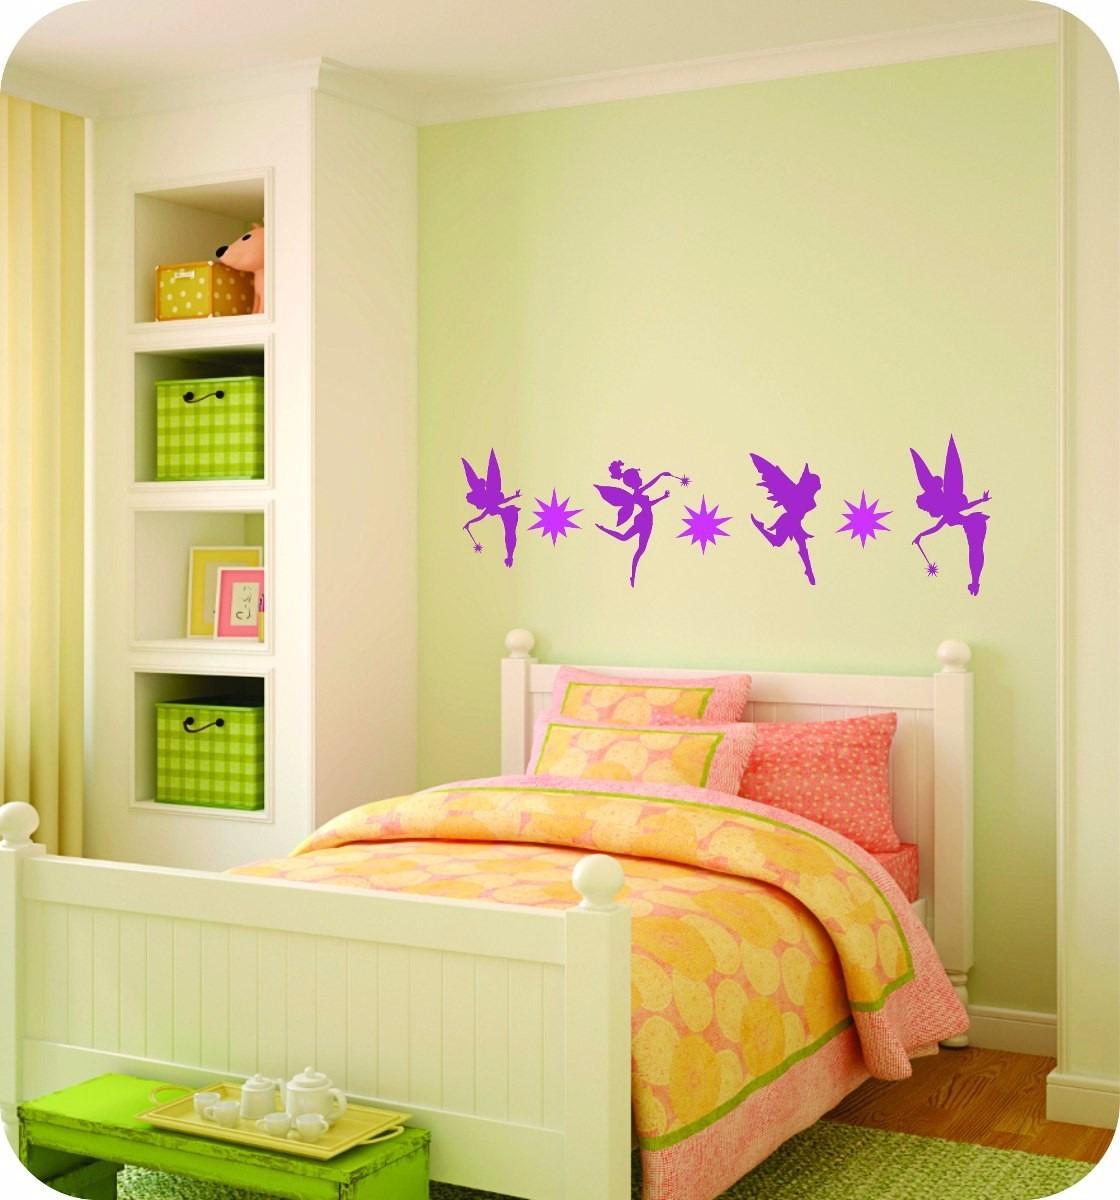 Hadas vinilo infantil ni as decoraci n casa cuarto for Decoracion cuarto infantil nina